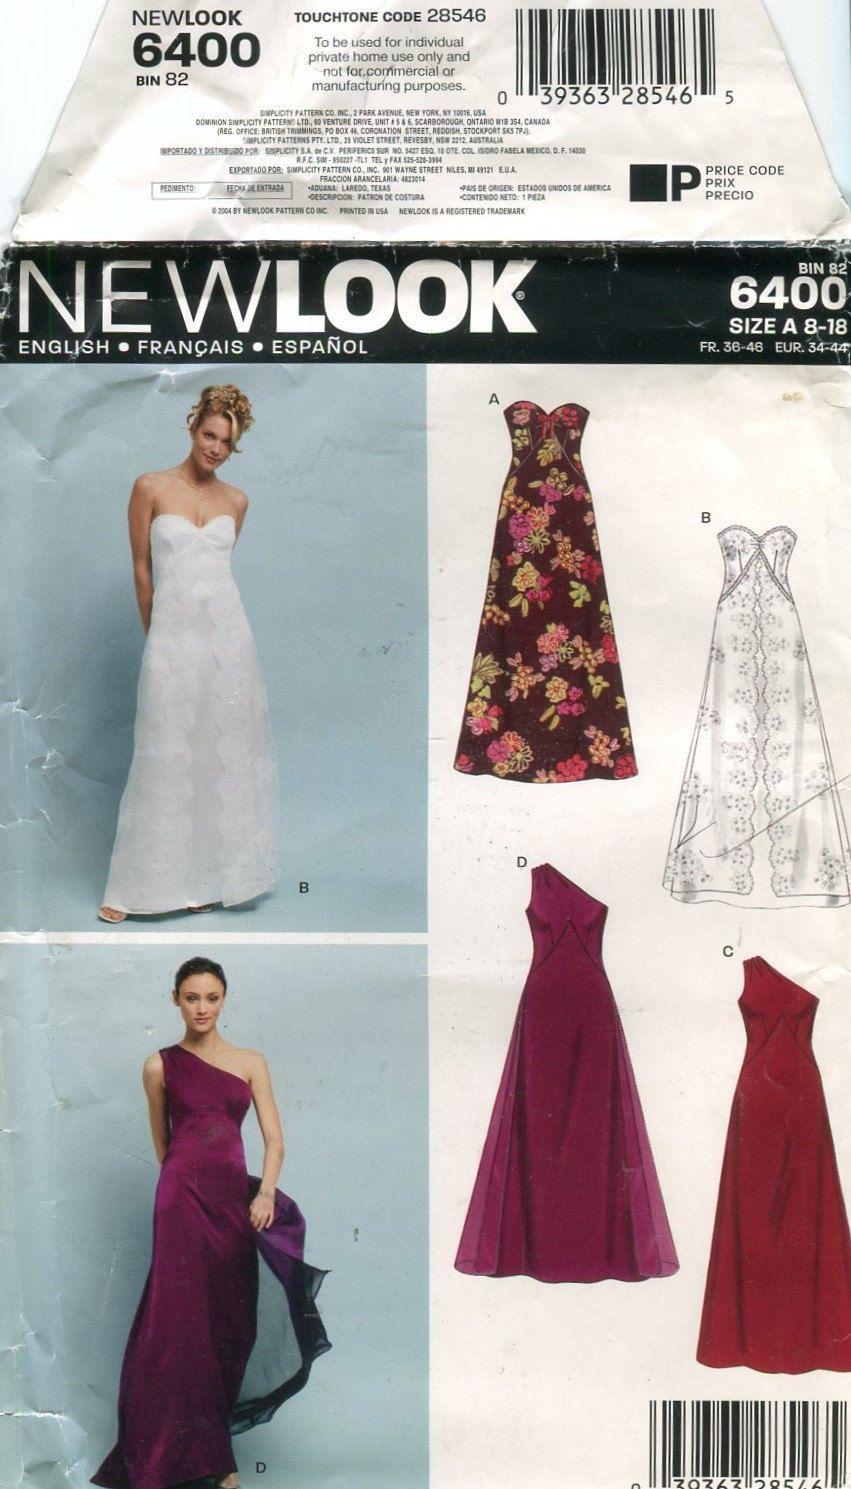 New Look 6400 One Shoulder Strapless Dress Overskirt Formal OOP ...